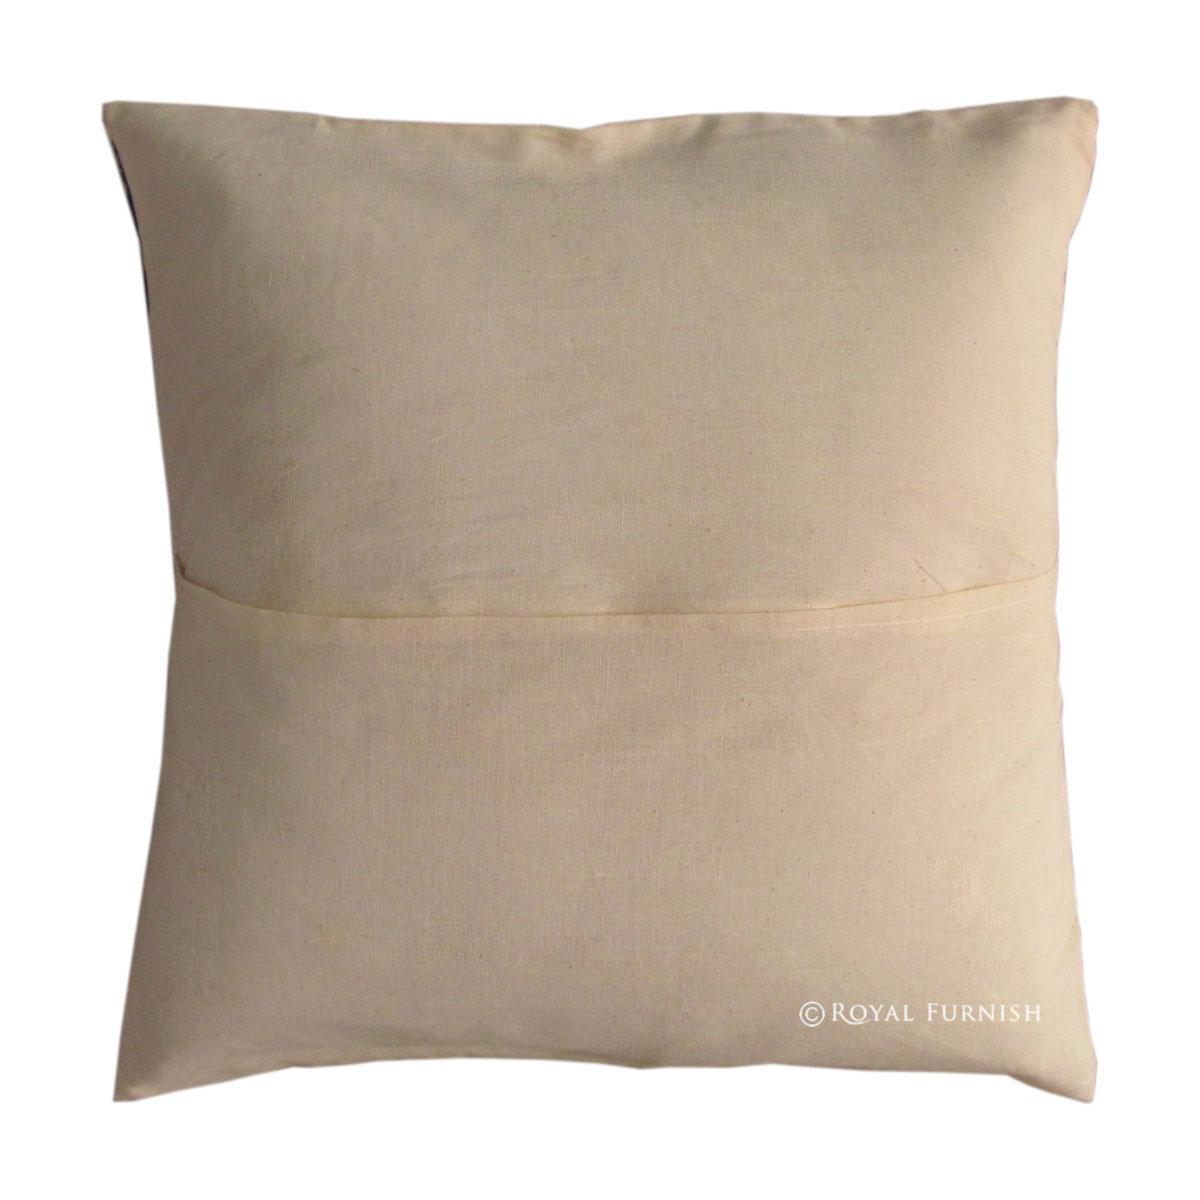 16 Quot Black Indian Hand Block Print Throw Pillow Cover